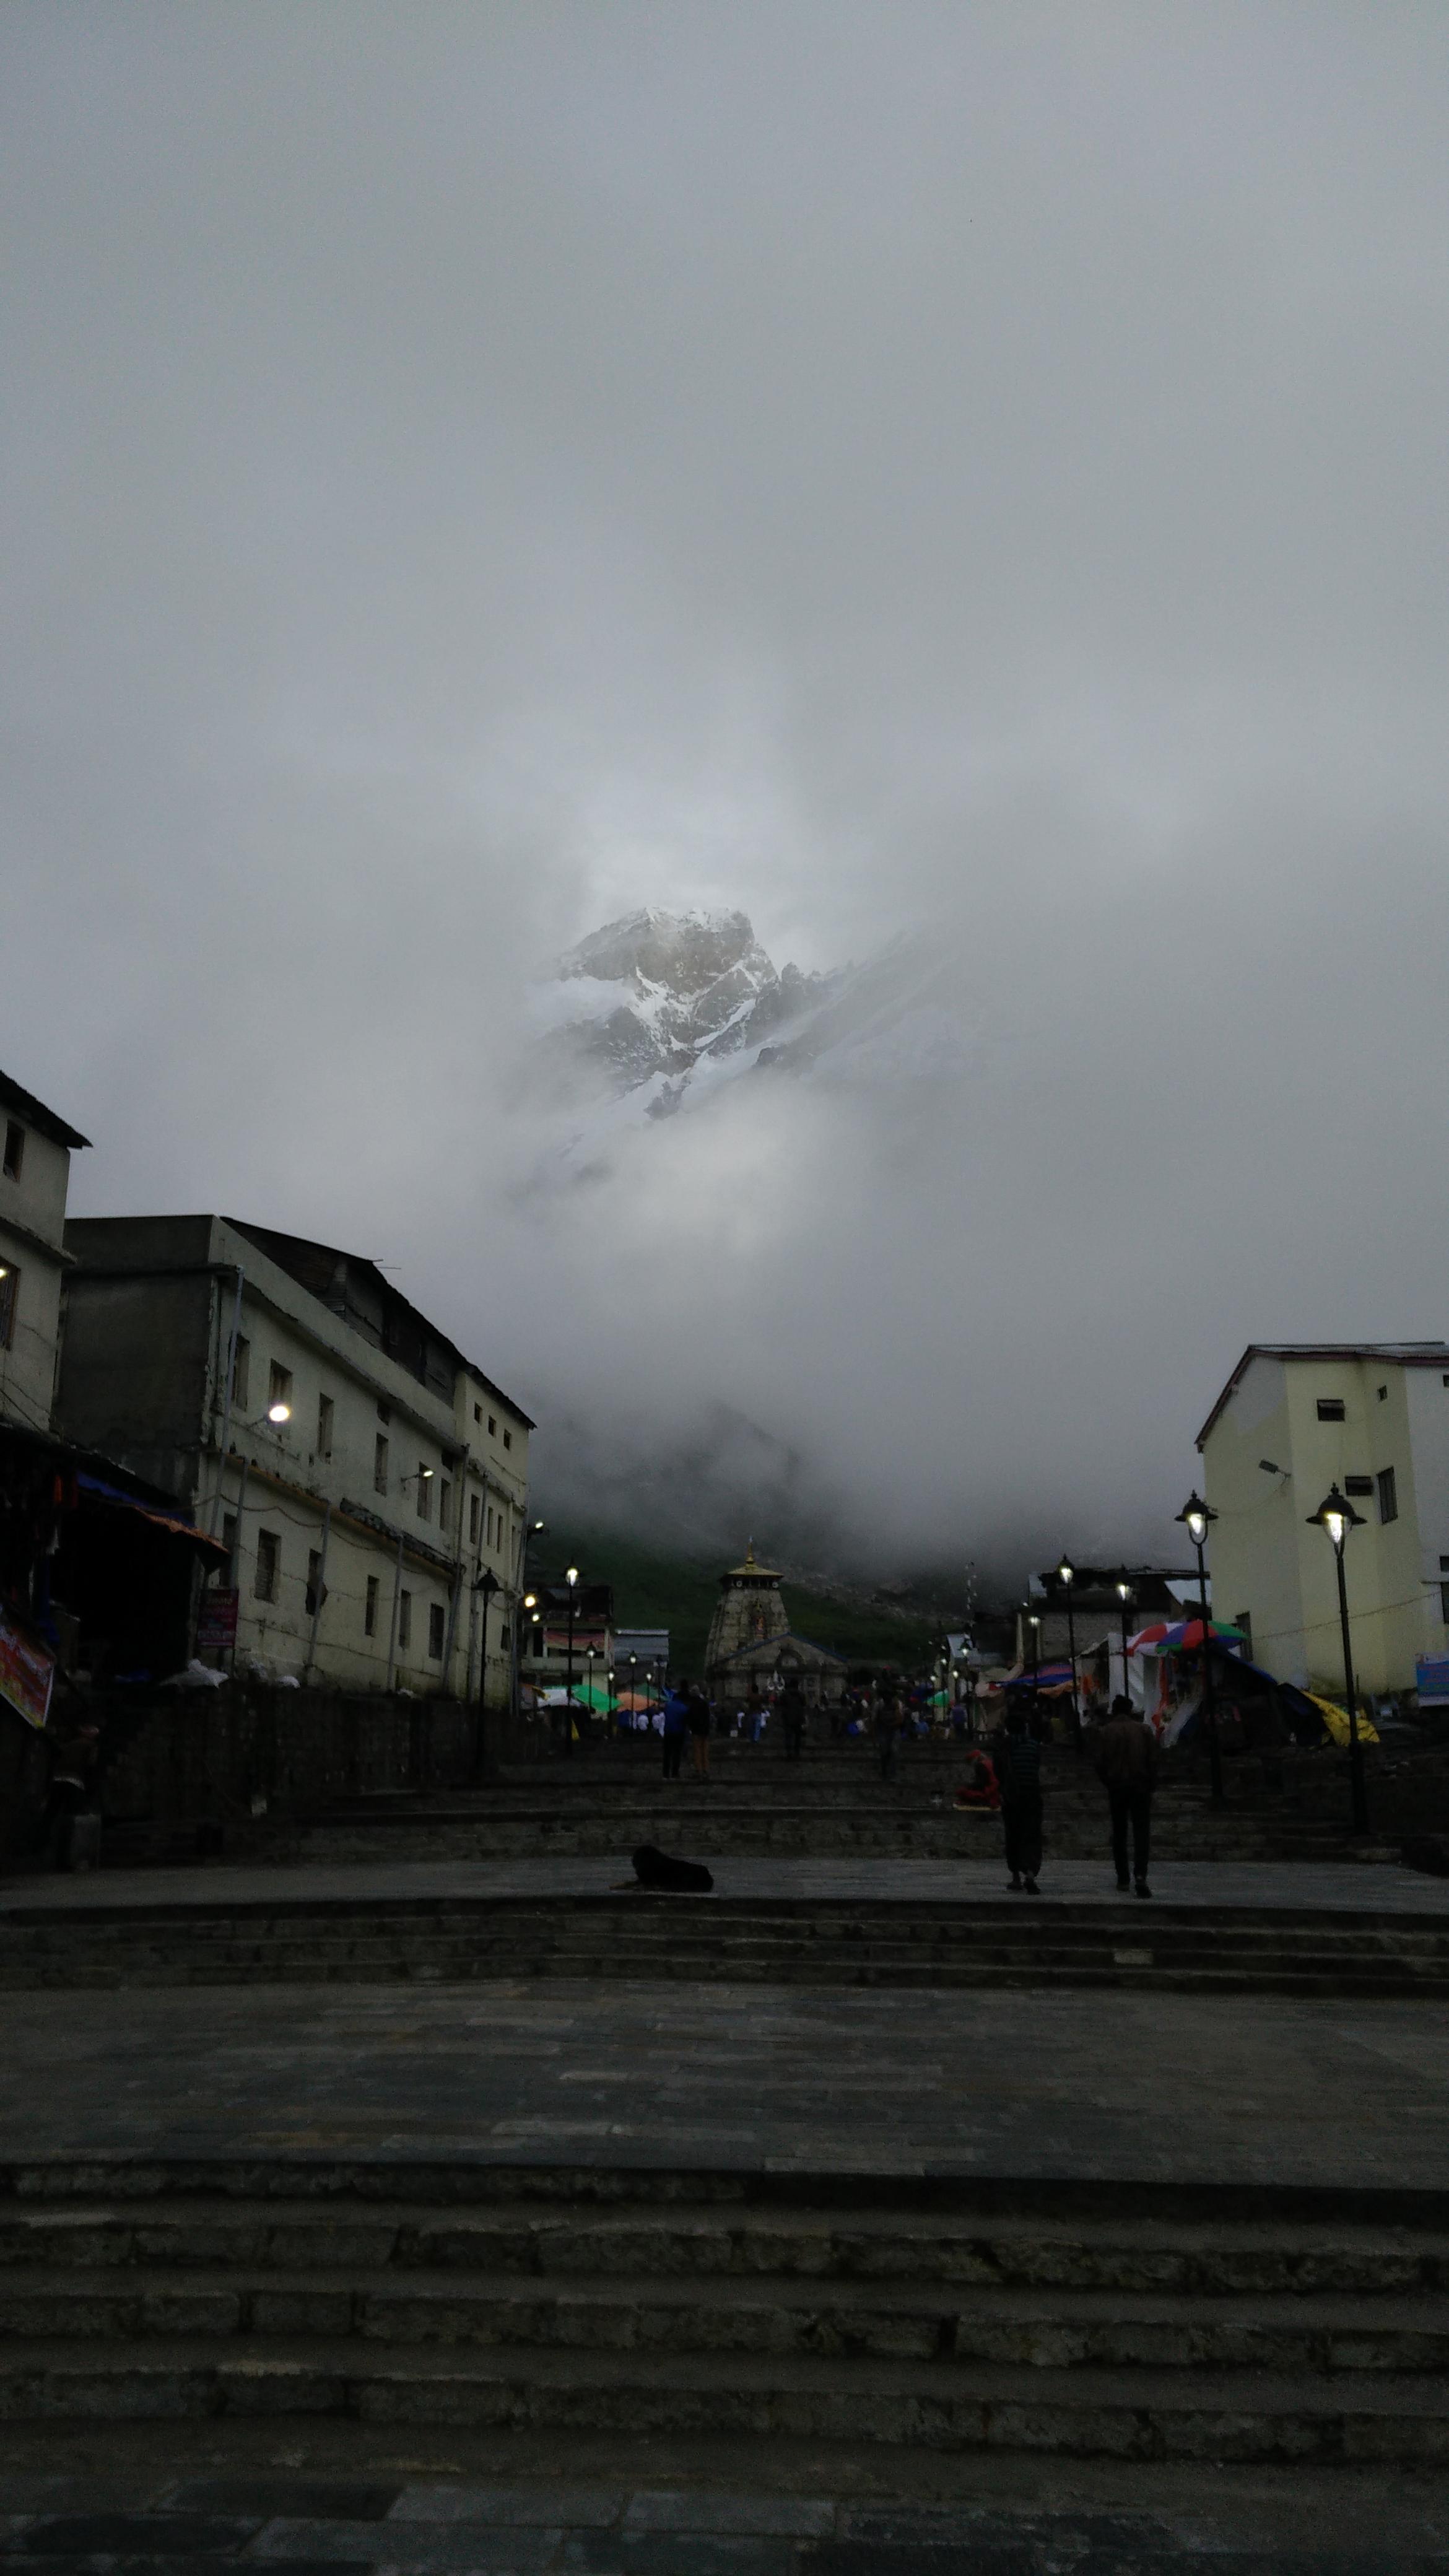 img_20180820_070531-jpg.6895 Shrines in Himalayas